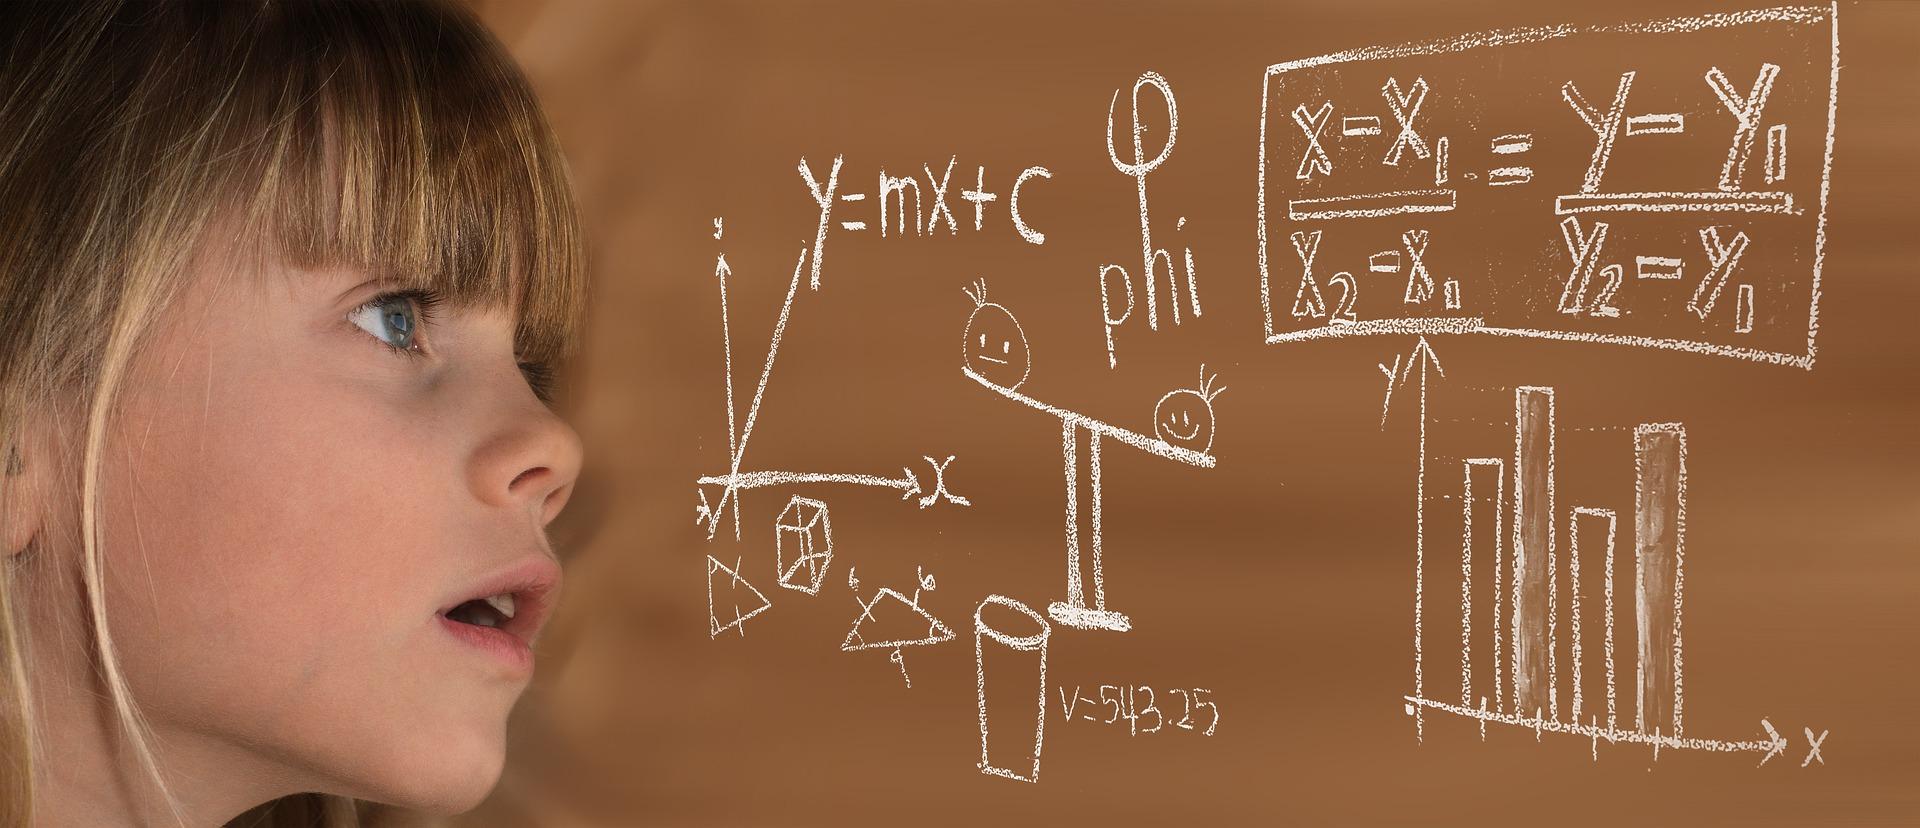 Matematikako lehiaketa 3.zikloan / Concours de maths pour le cycle 3